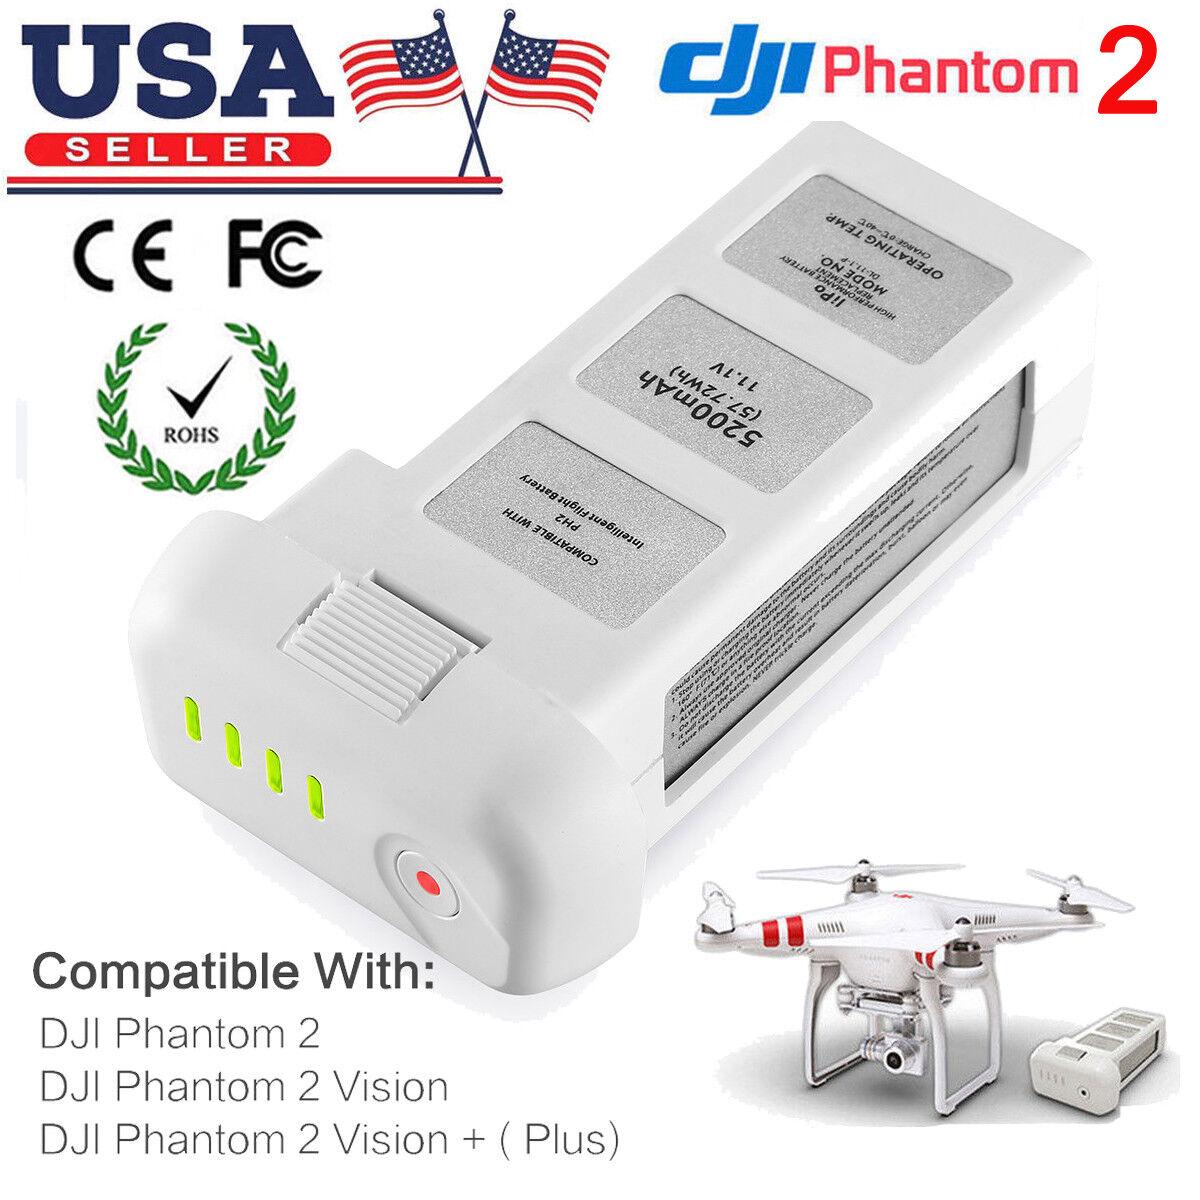 DJI Phantom 2 (Vision) Best Price $1262 69 - Small Drones - Compare